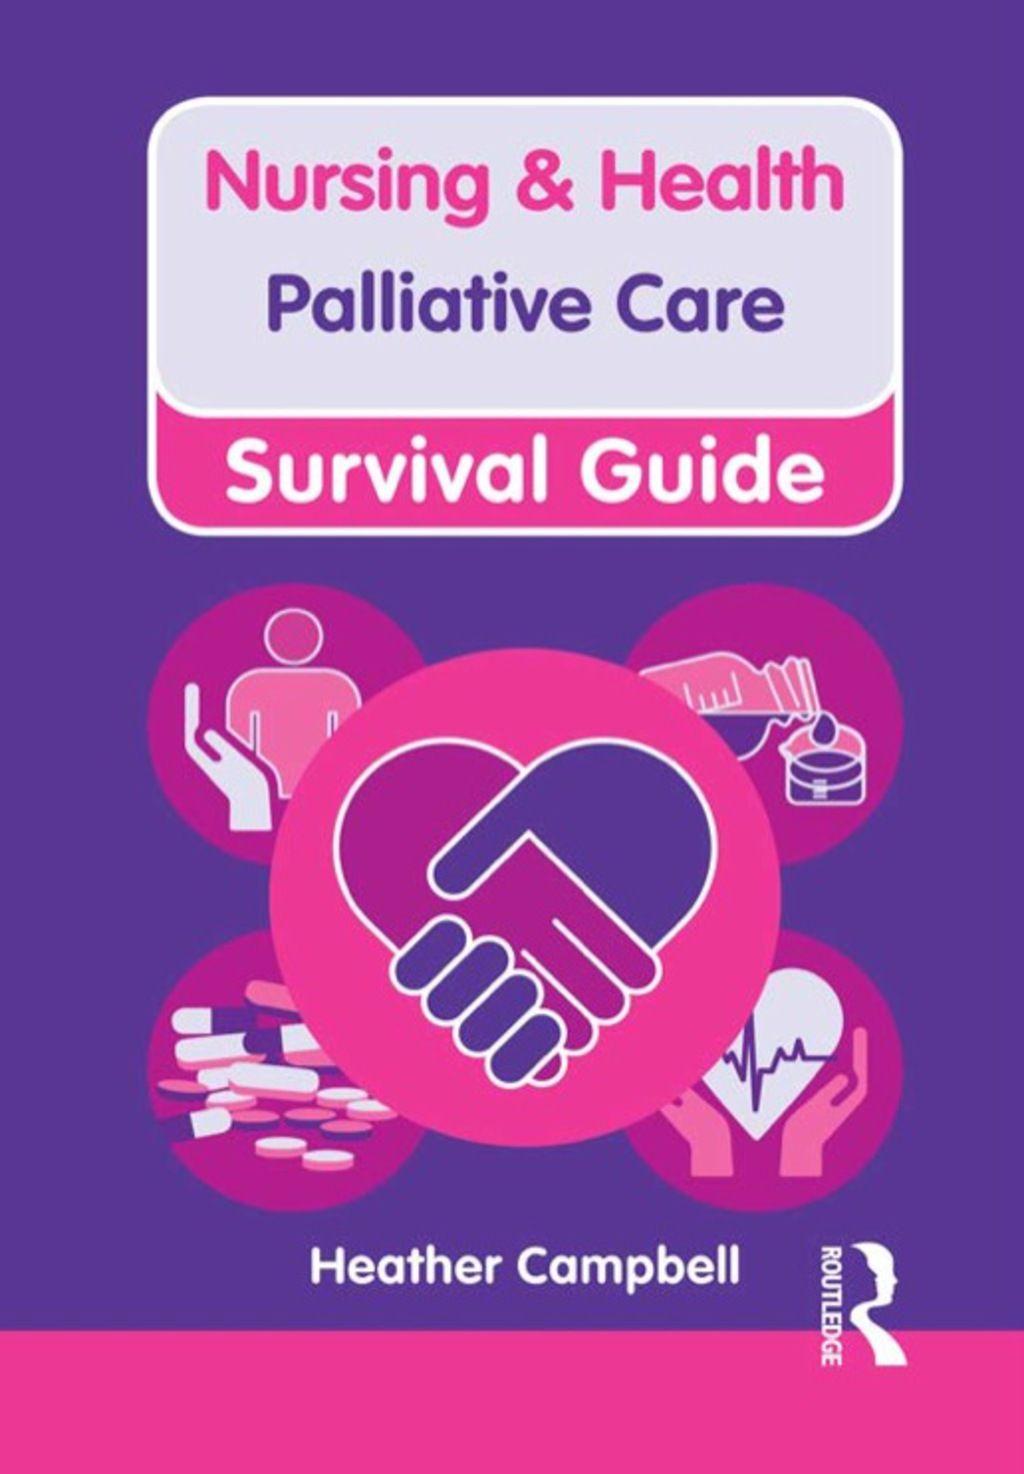 Nursing & Health Survival Guide Palliative Care (eBook